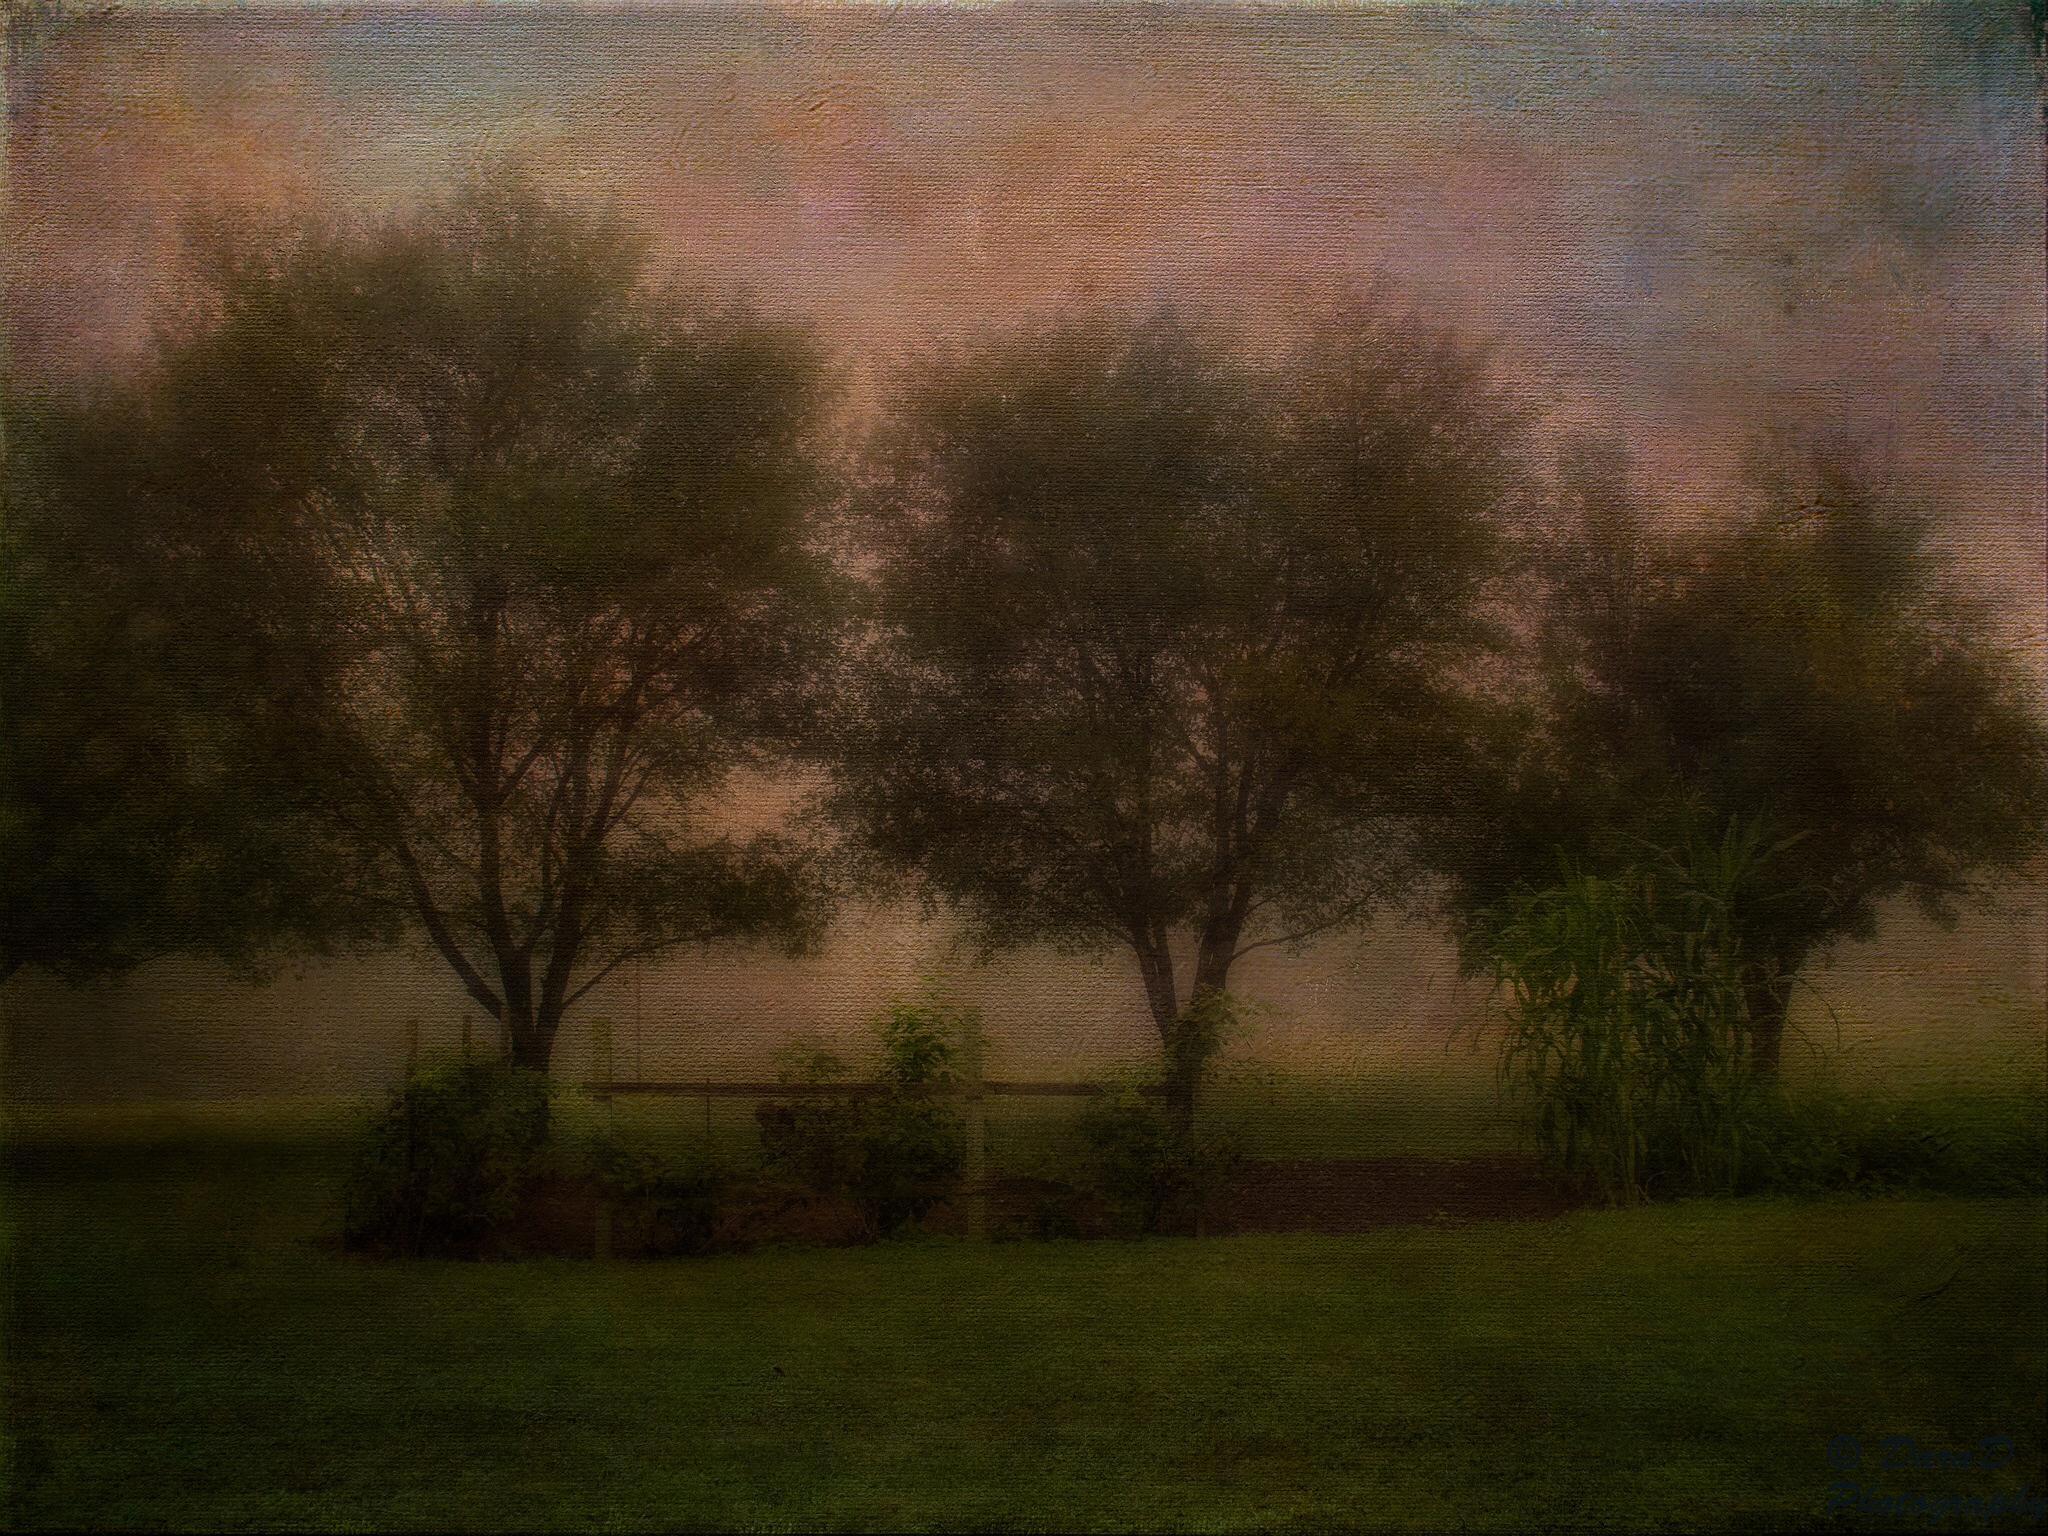 Trees Three by DaraD Photography